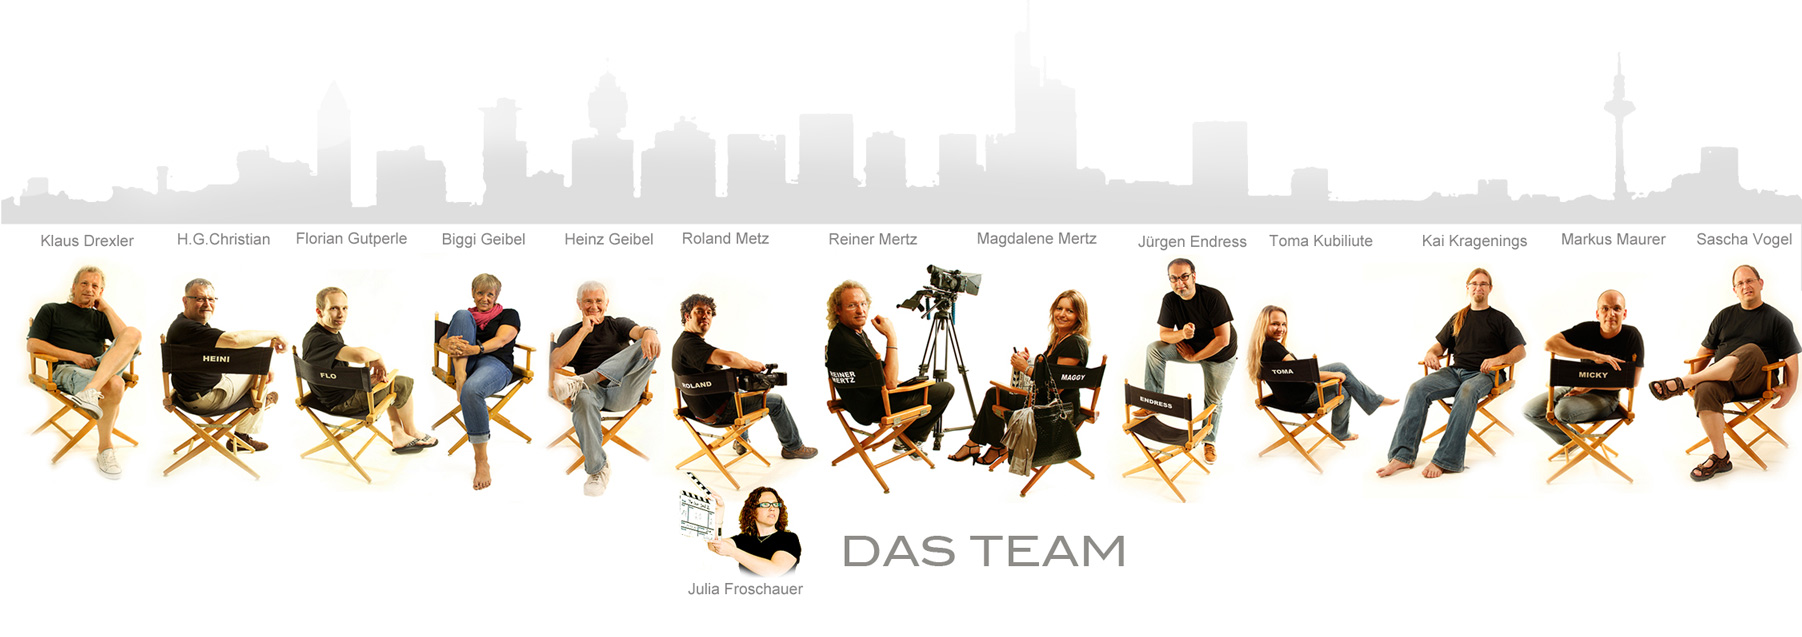 das_team1